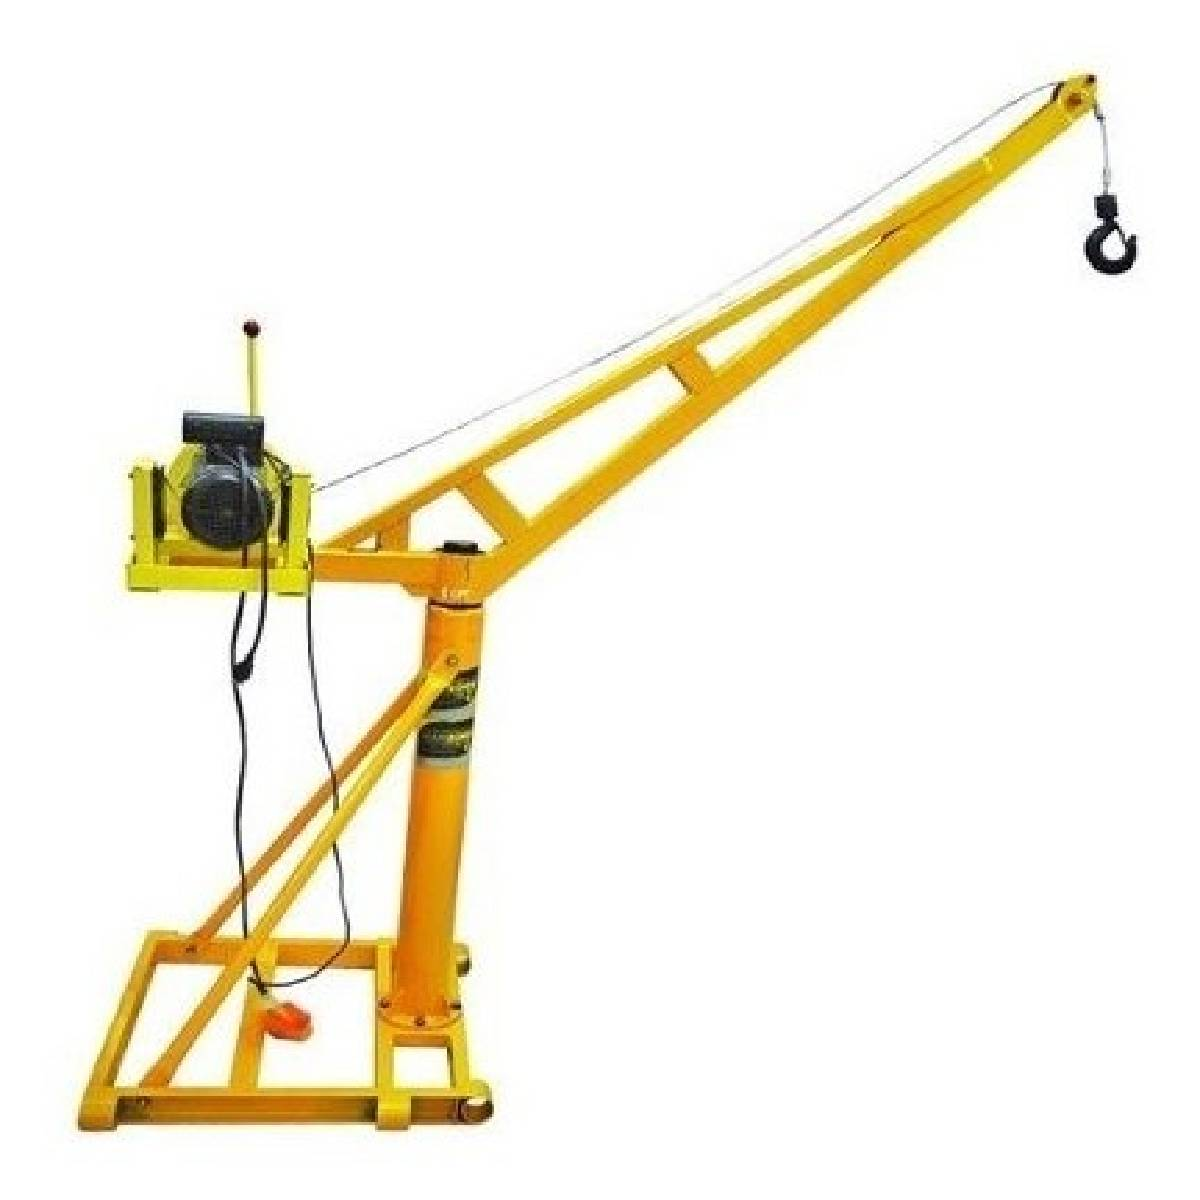 Polipasto Grua Portable 1000 Kg Con Cable 30 M 220v Kingsman